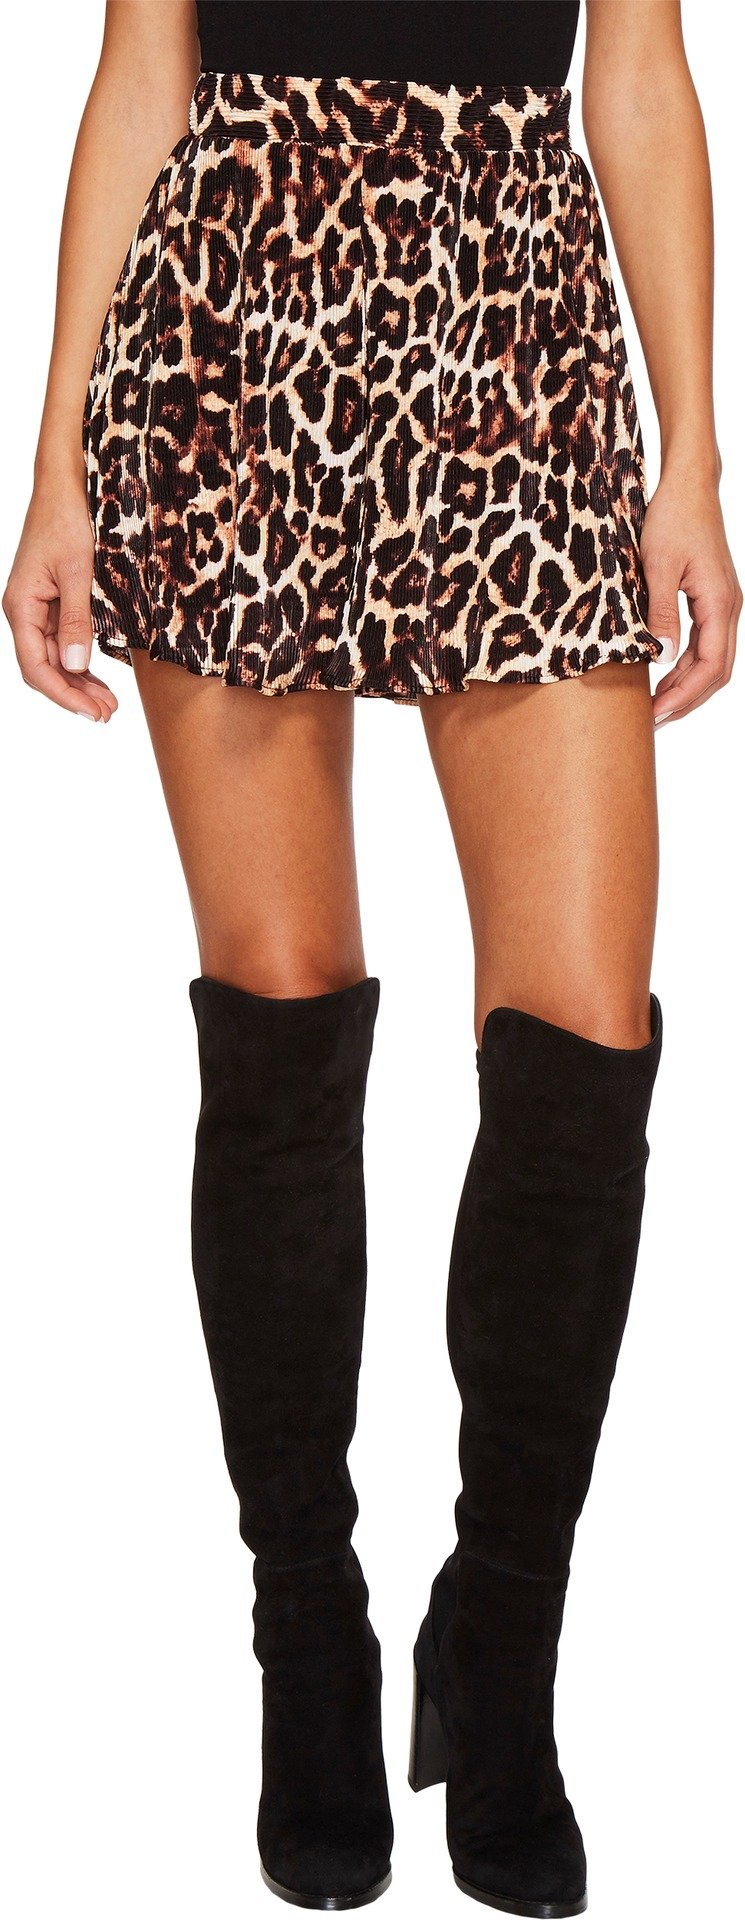 Show Me Your Mumu Women's Carlos Swing Shorts Coyote Kitty Pleat Medium